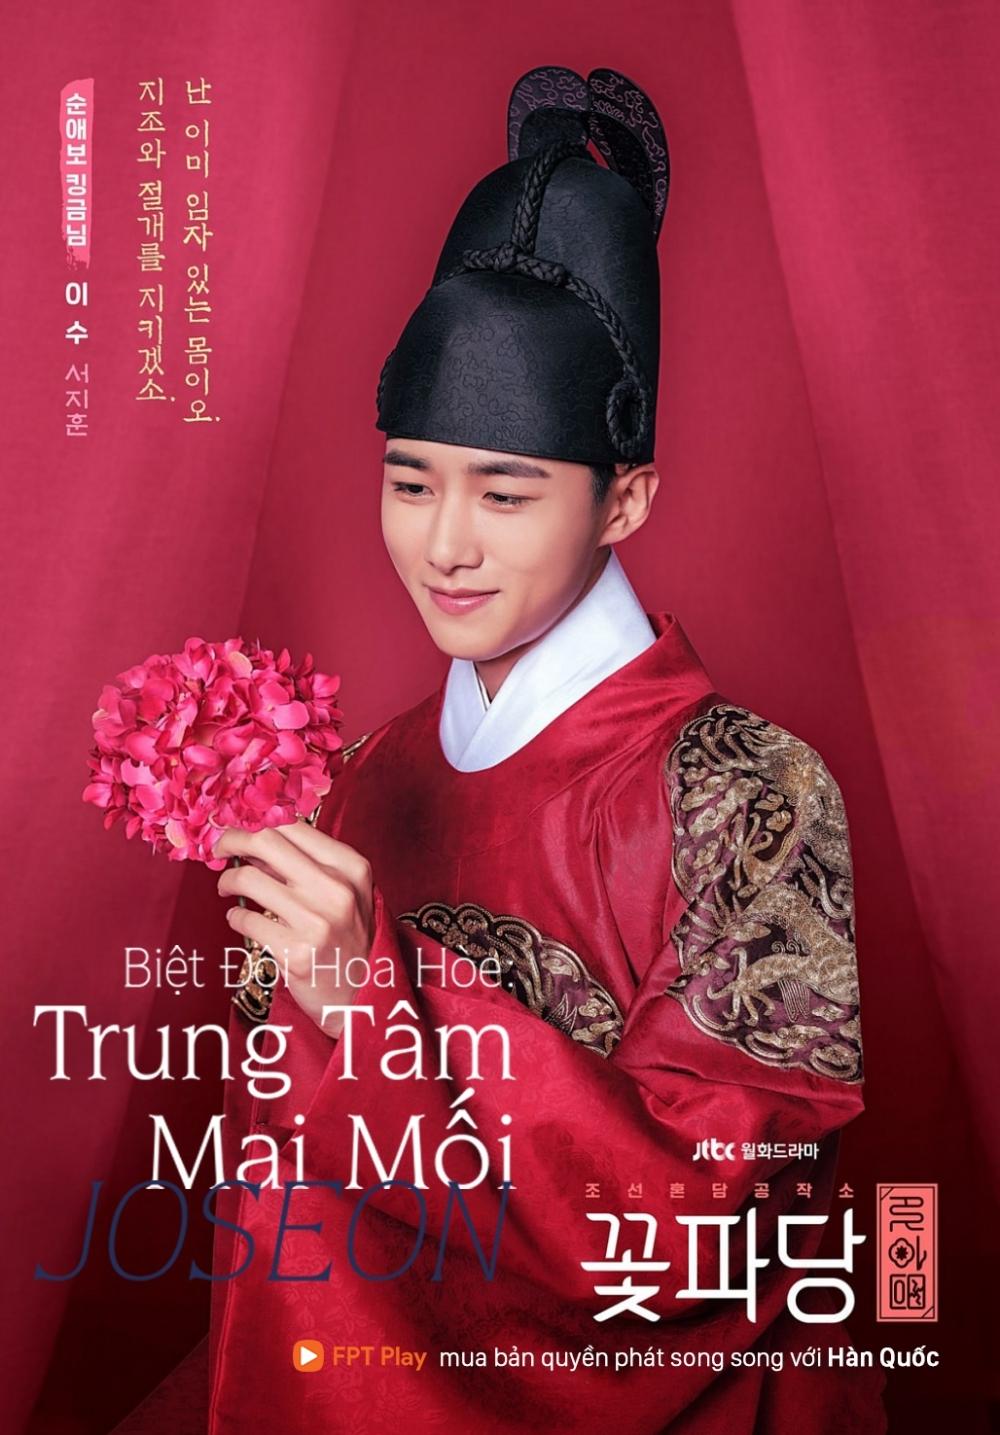 dan my nam dep hon hoa trong flower crew joseon marriage agency biet doi hoa hoe trung tam mai moi joseon